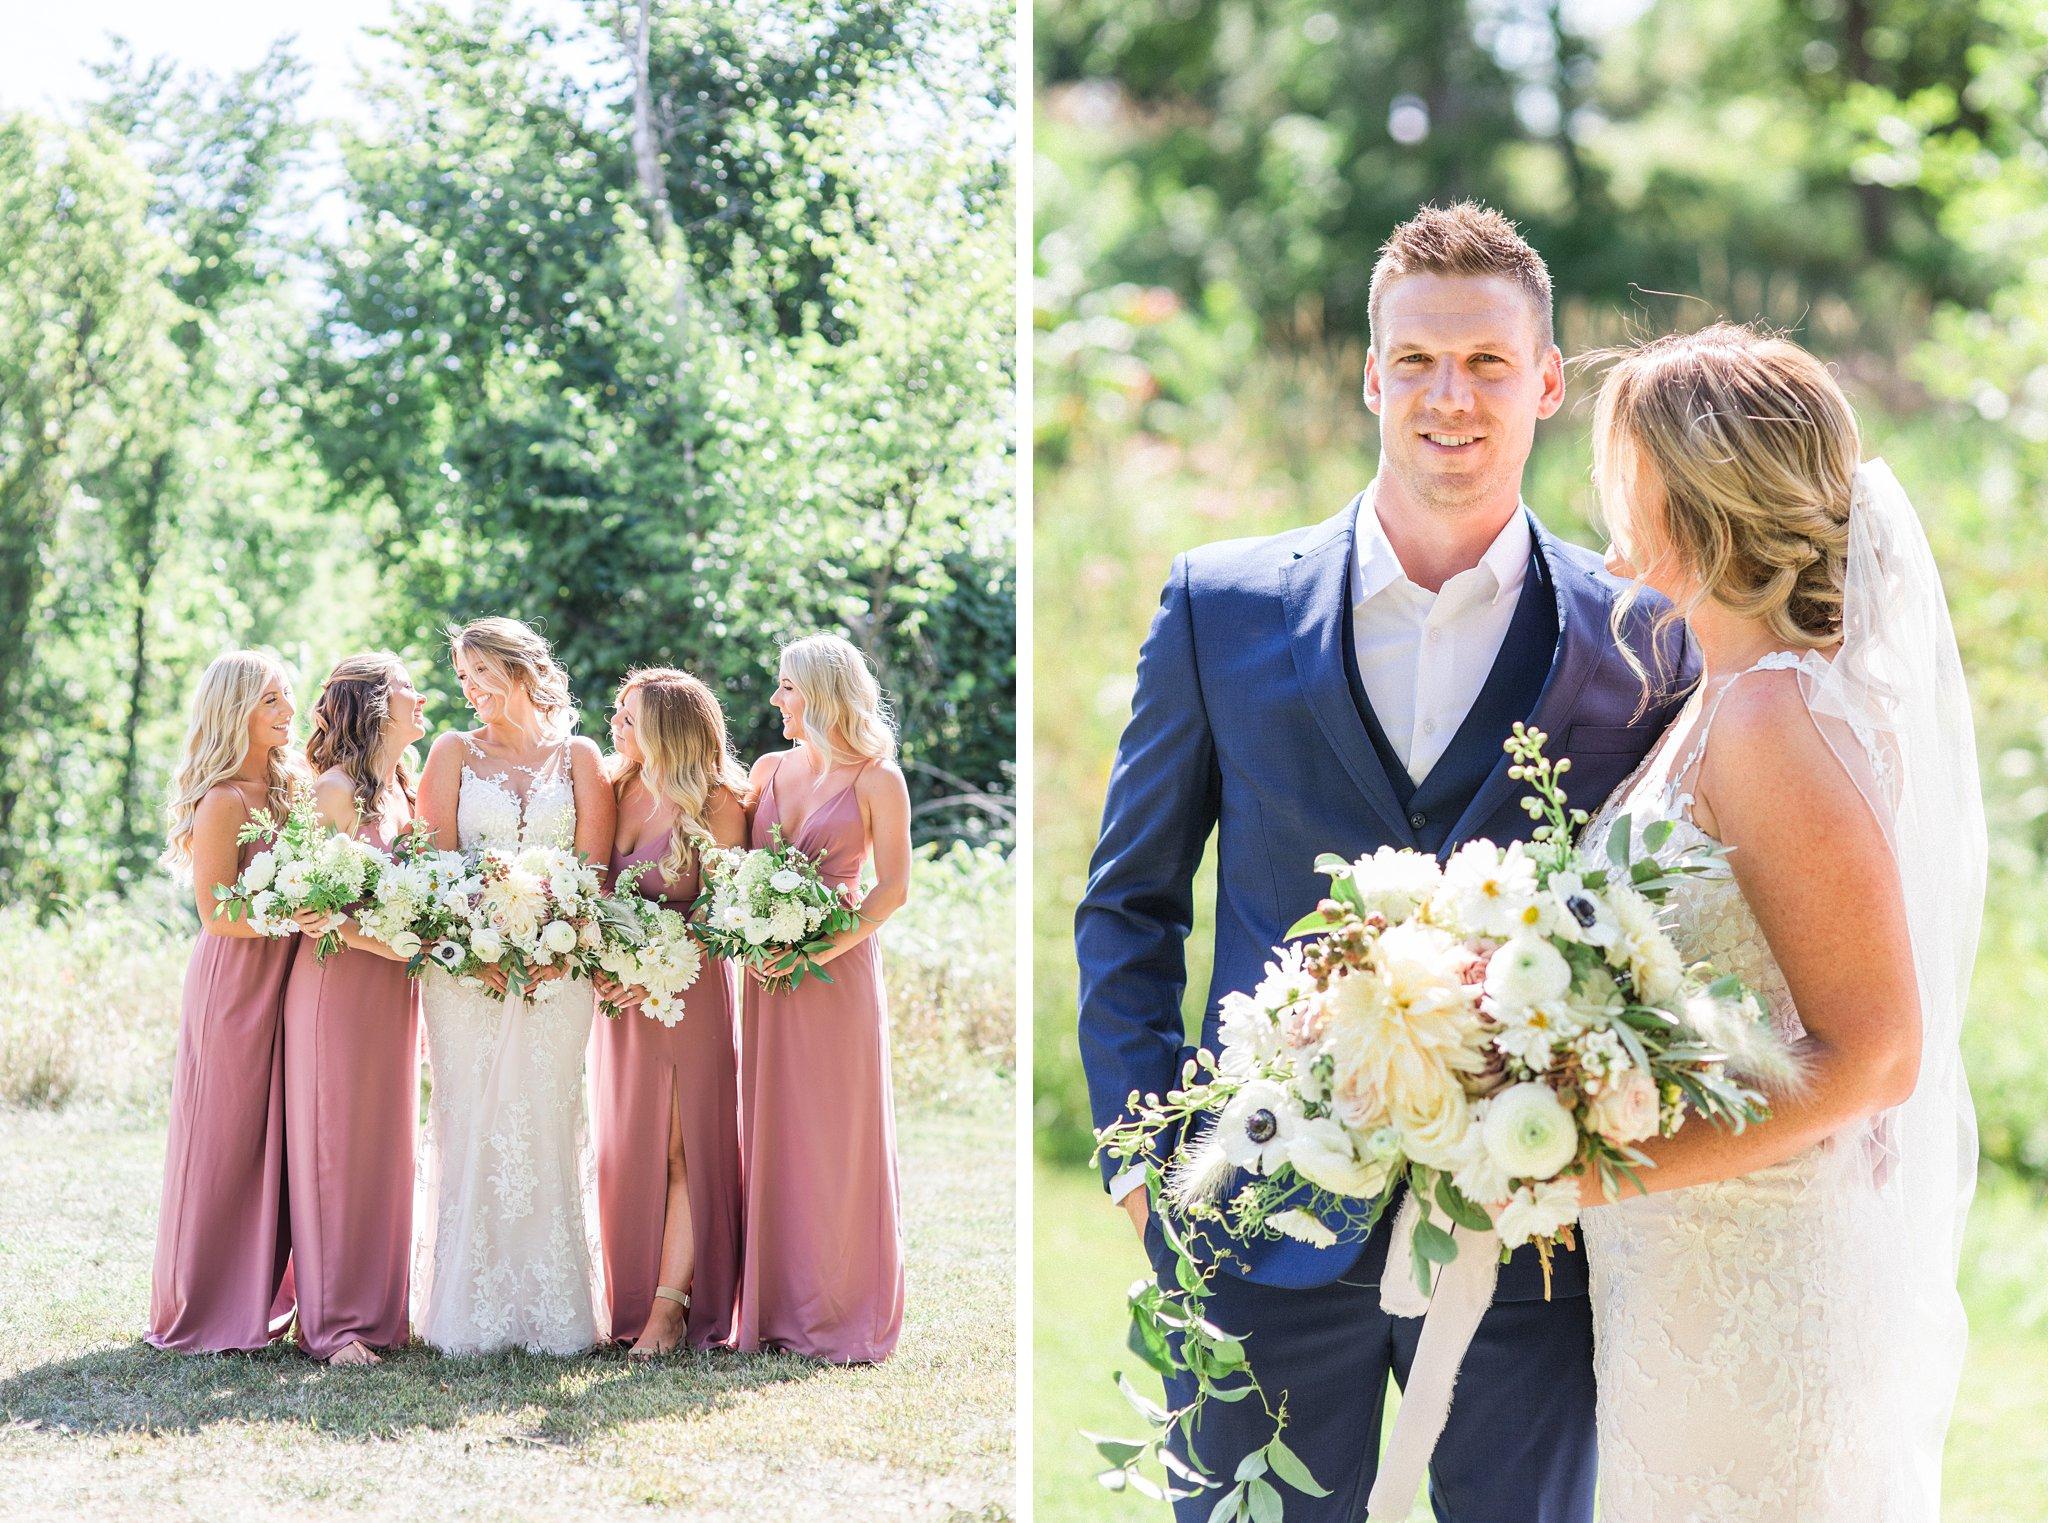 Mauve bridesmaid dresses, groom, blue suit, no tie, Private Estate Wedding Photos, Amy Pinder Photography